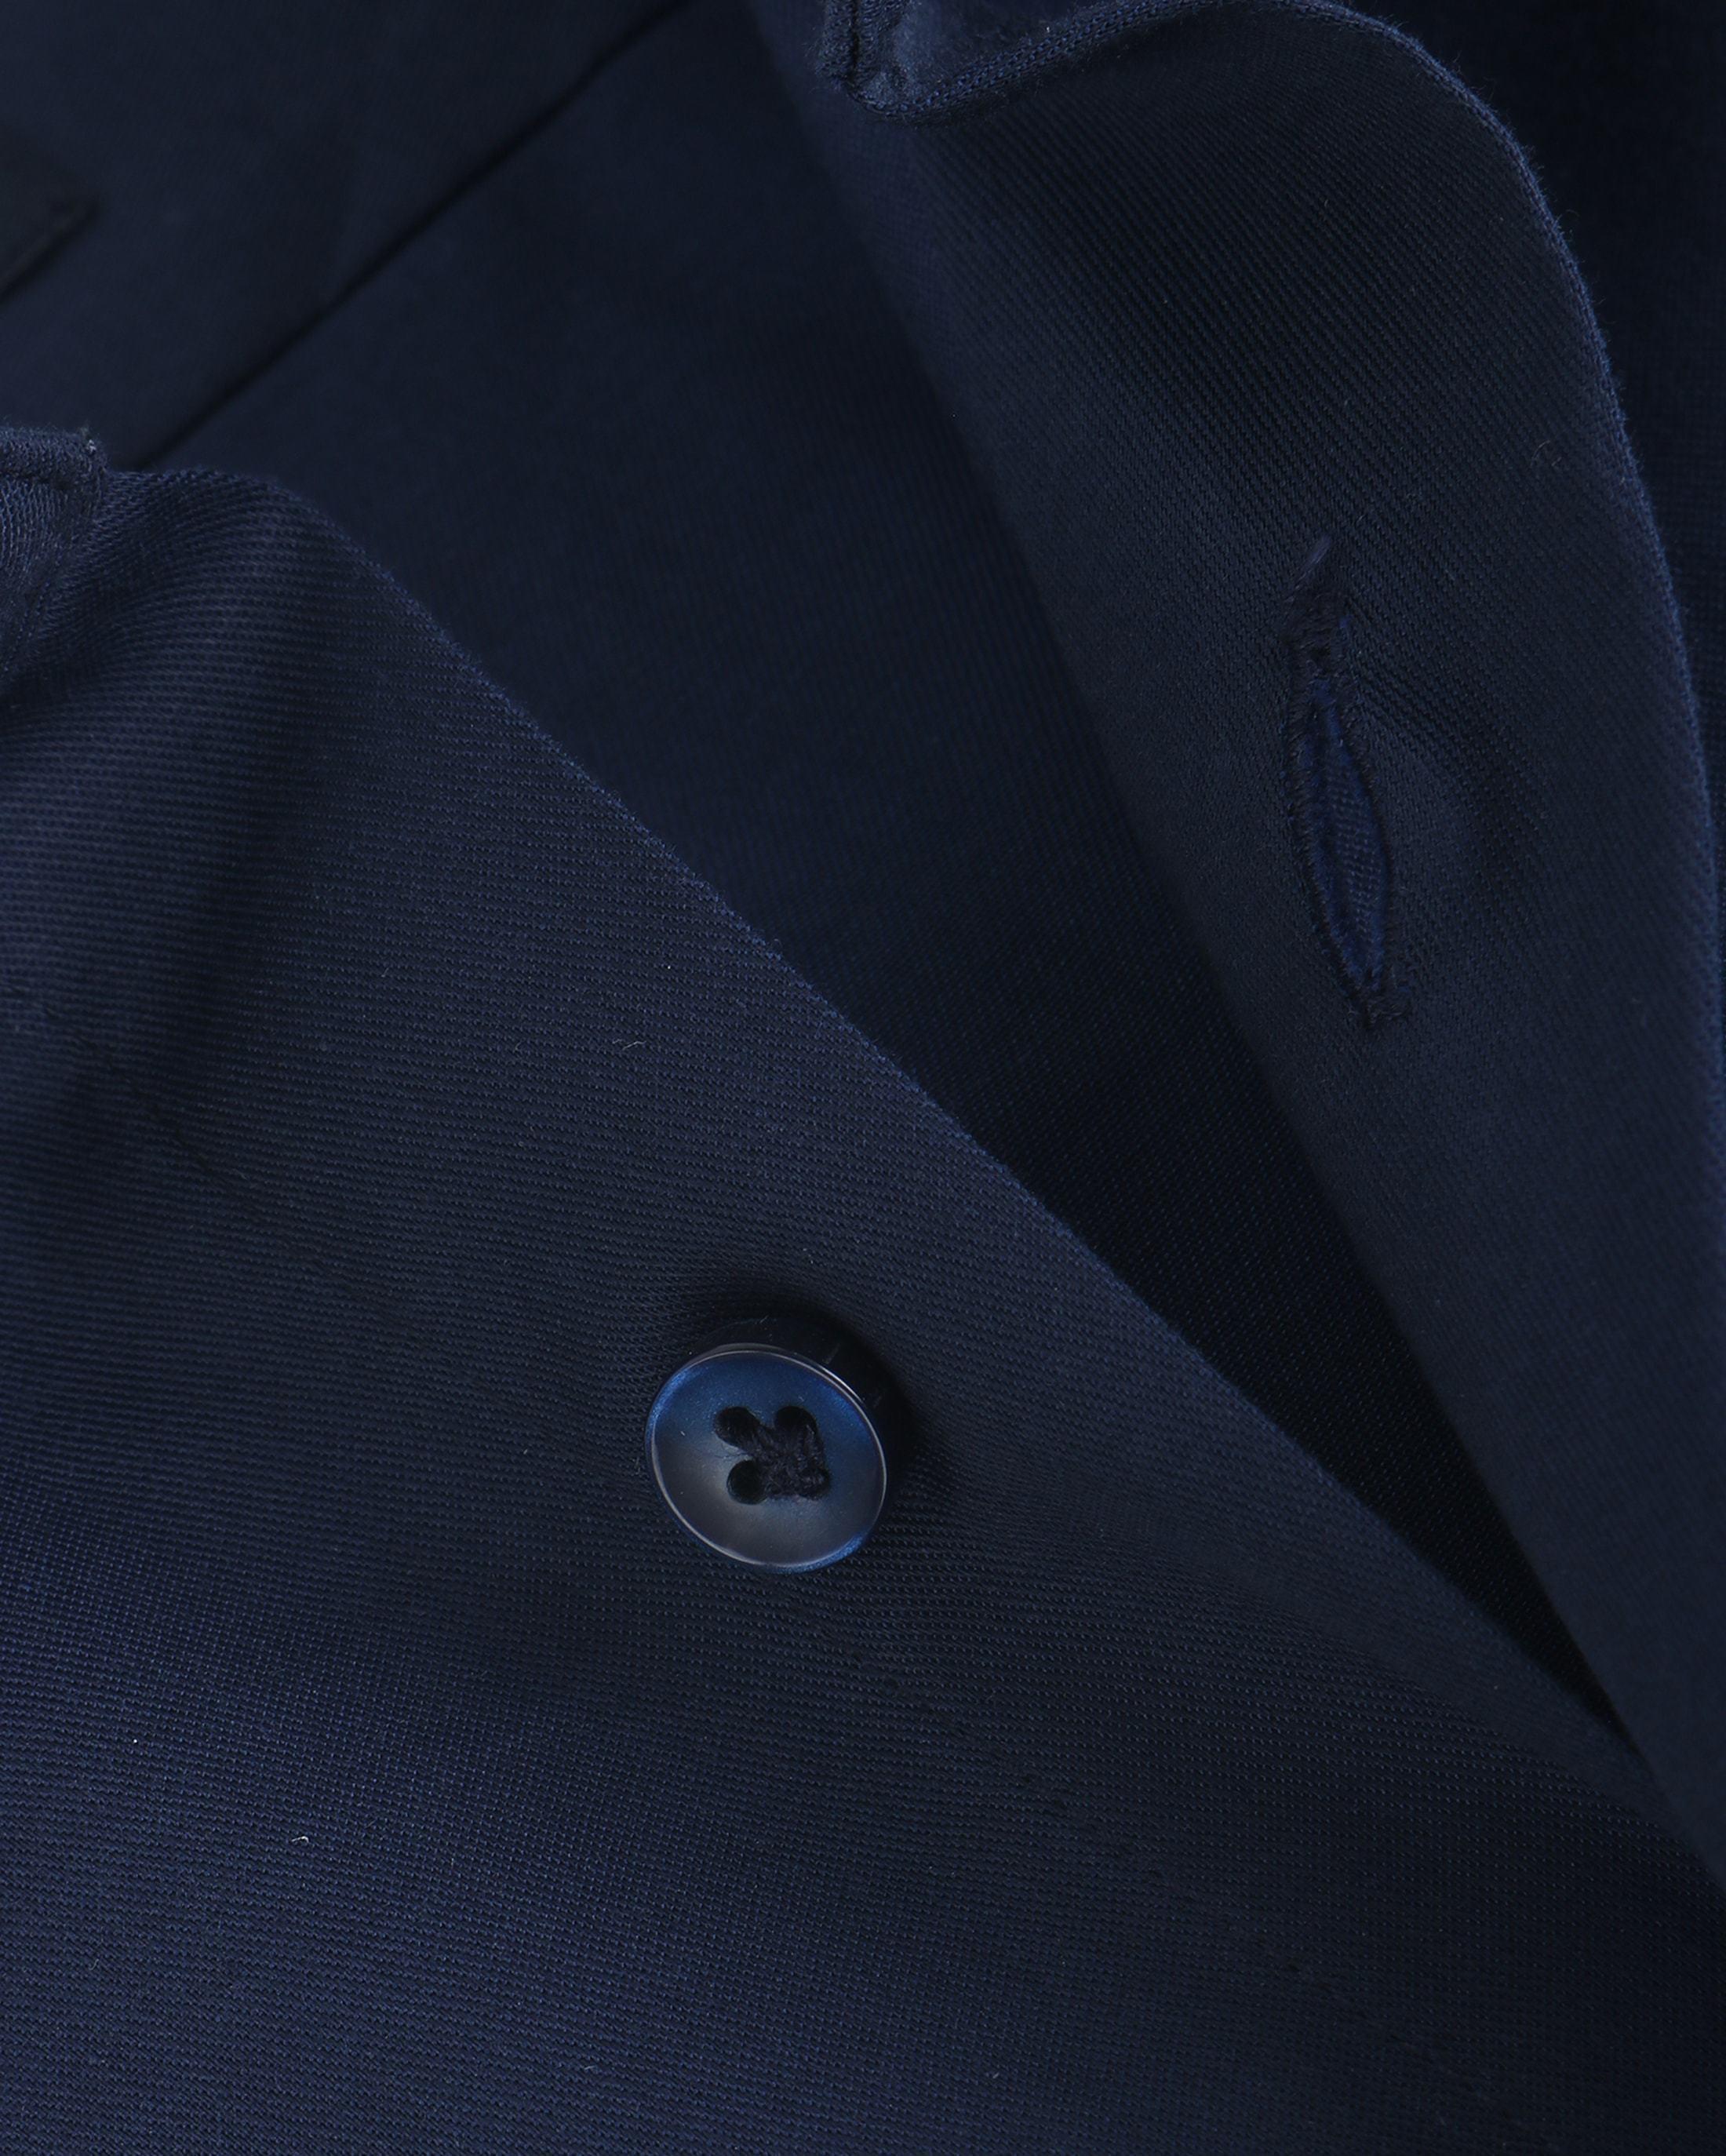 Profuomo Shirt Slim Fit Navy foto 1